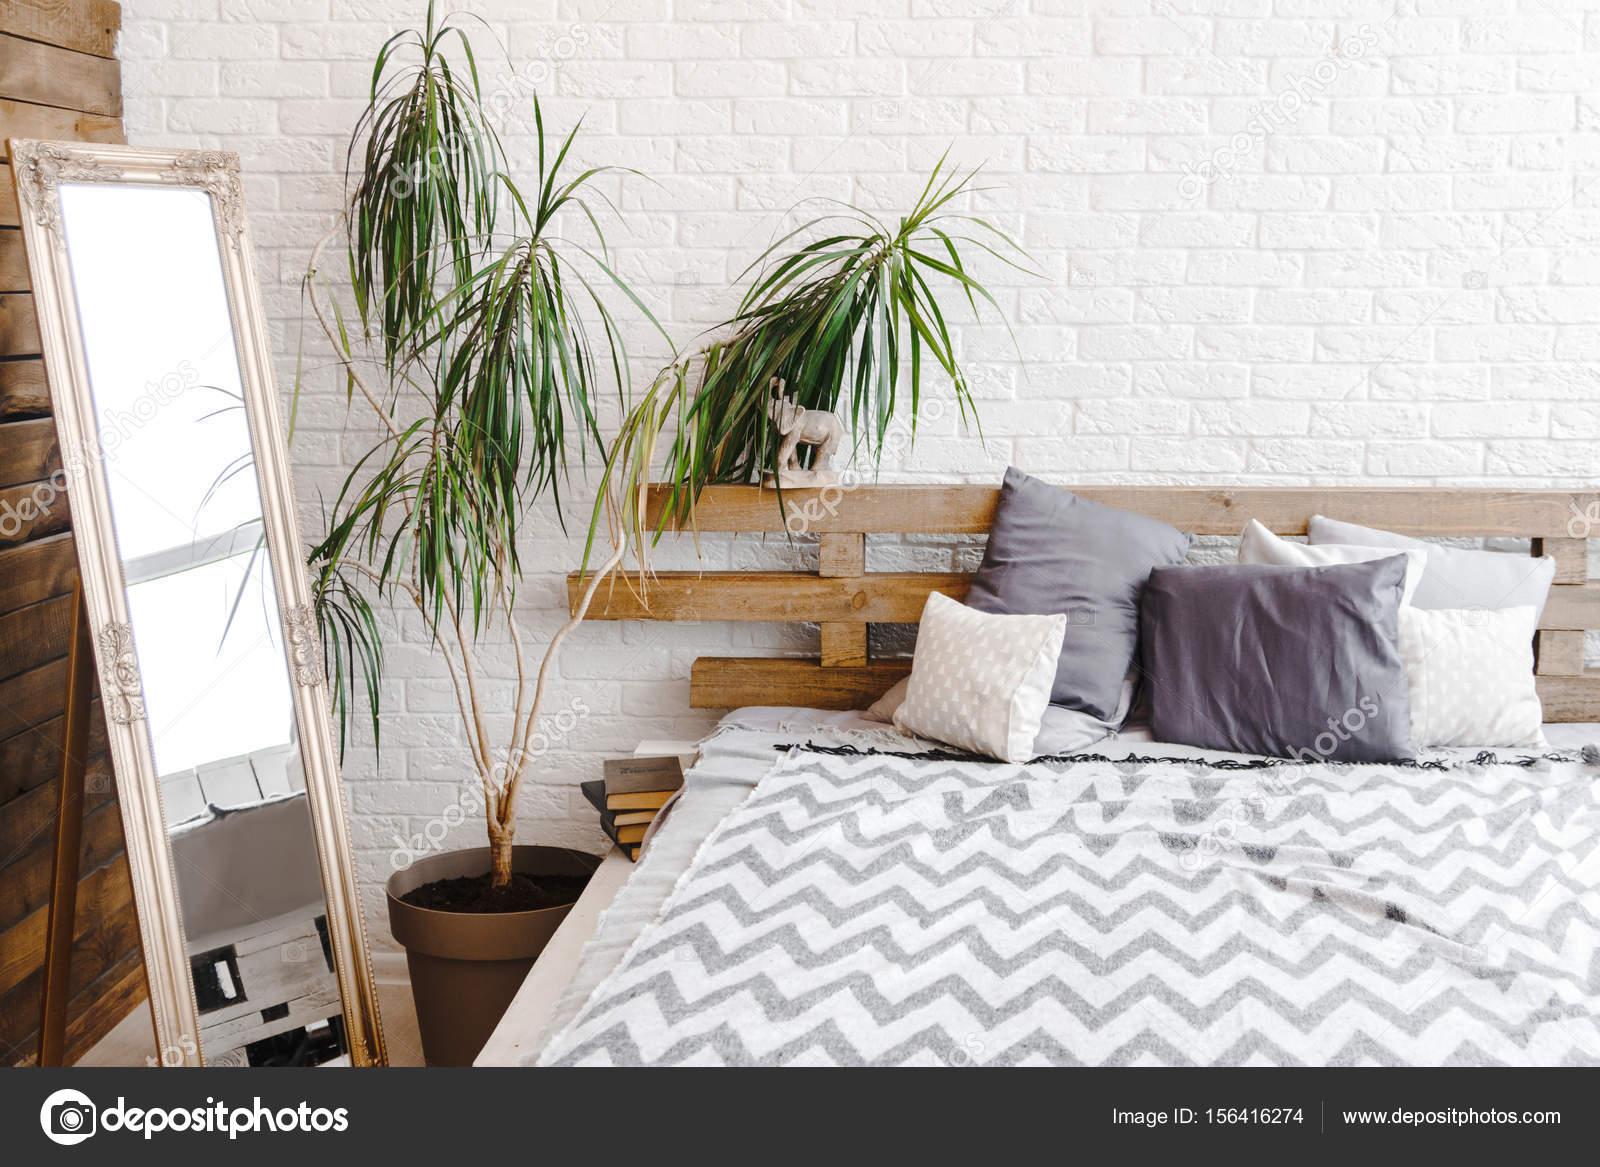 Moderne studio decor ontwerp met pallets bed plant in vaas en